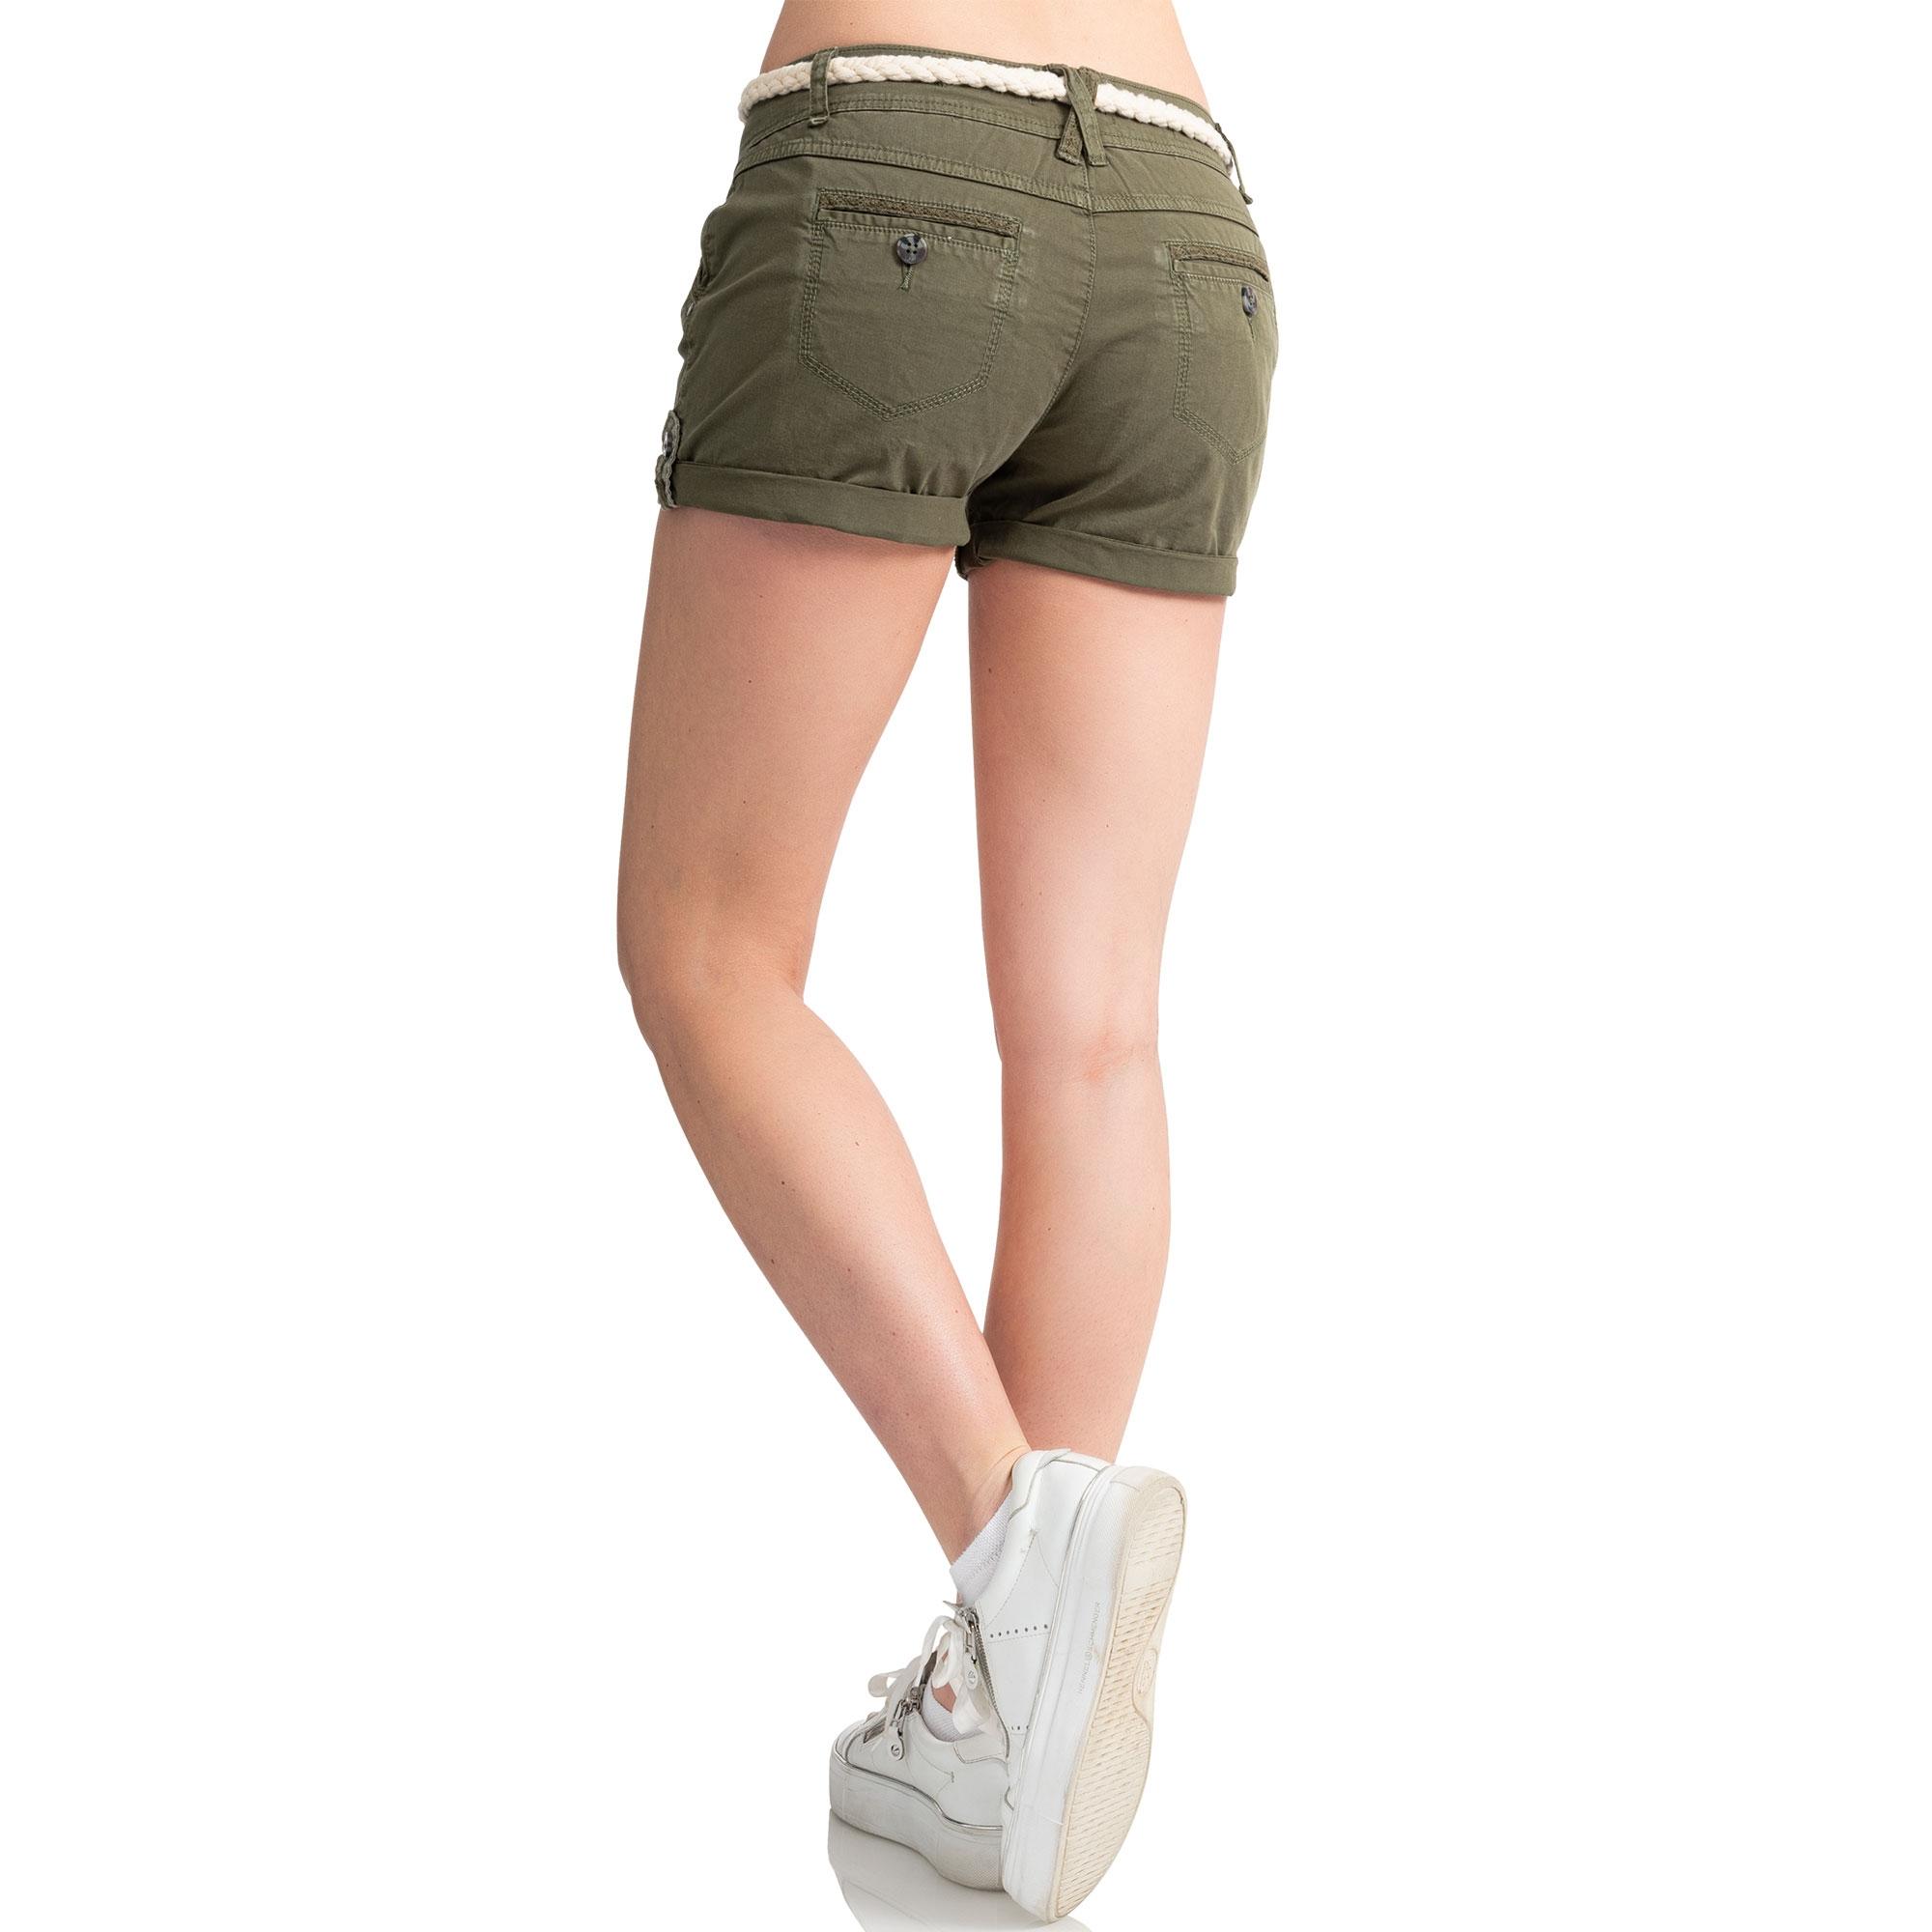 Indexbild 18 - Eight2Nine Damen Chino Bermuda Stretch Shorts mit Flecht Gürtel Hotpants